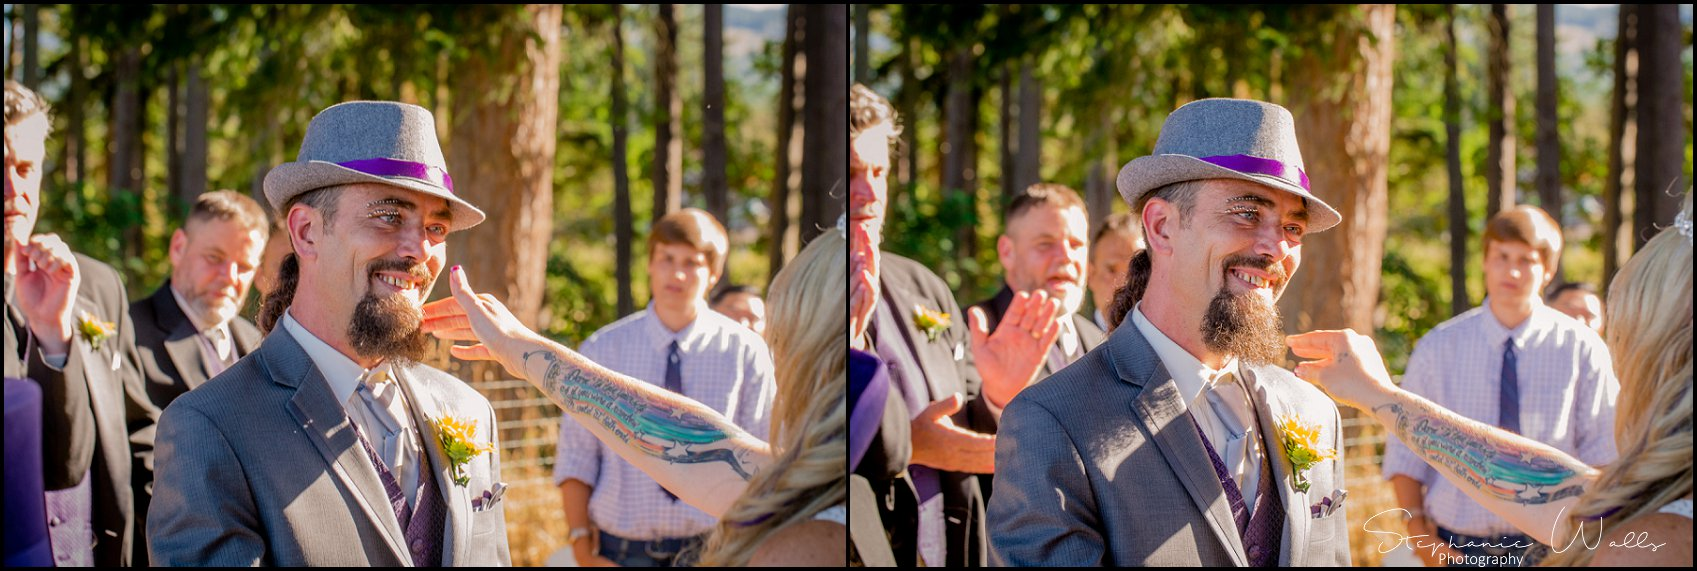 Everist Wedding 241 Patti & Bobbys | Troll Haven Castle & Bandy Farms | Sequim, Wa Wedding Photographer